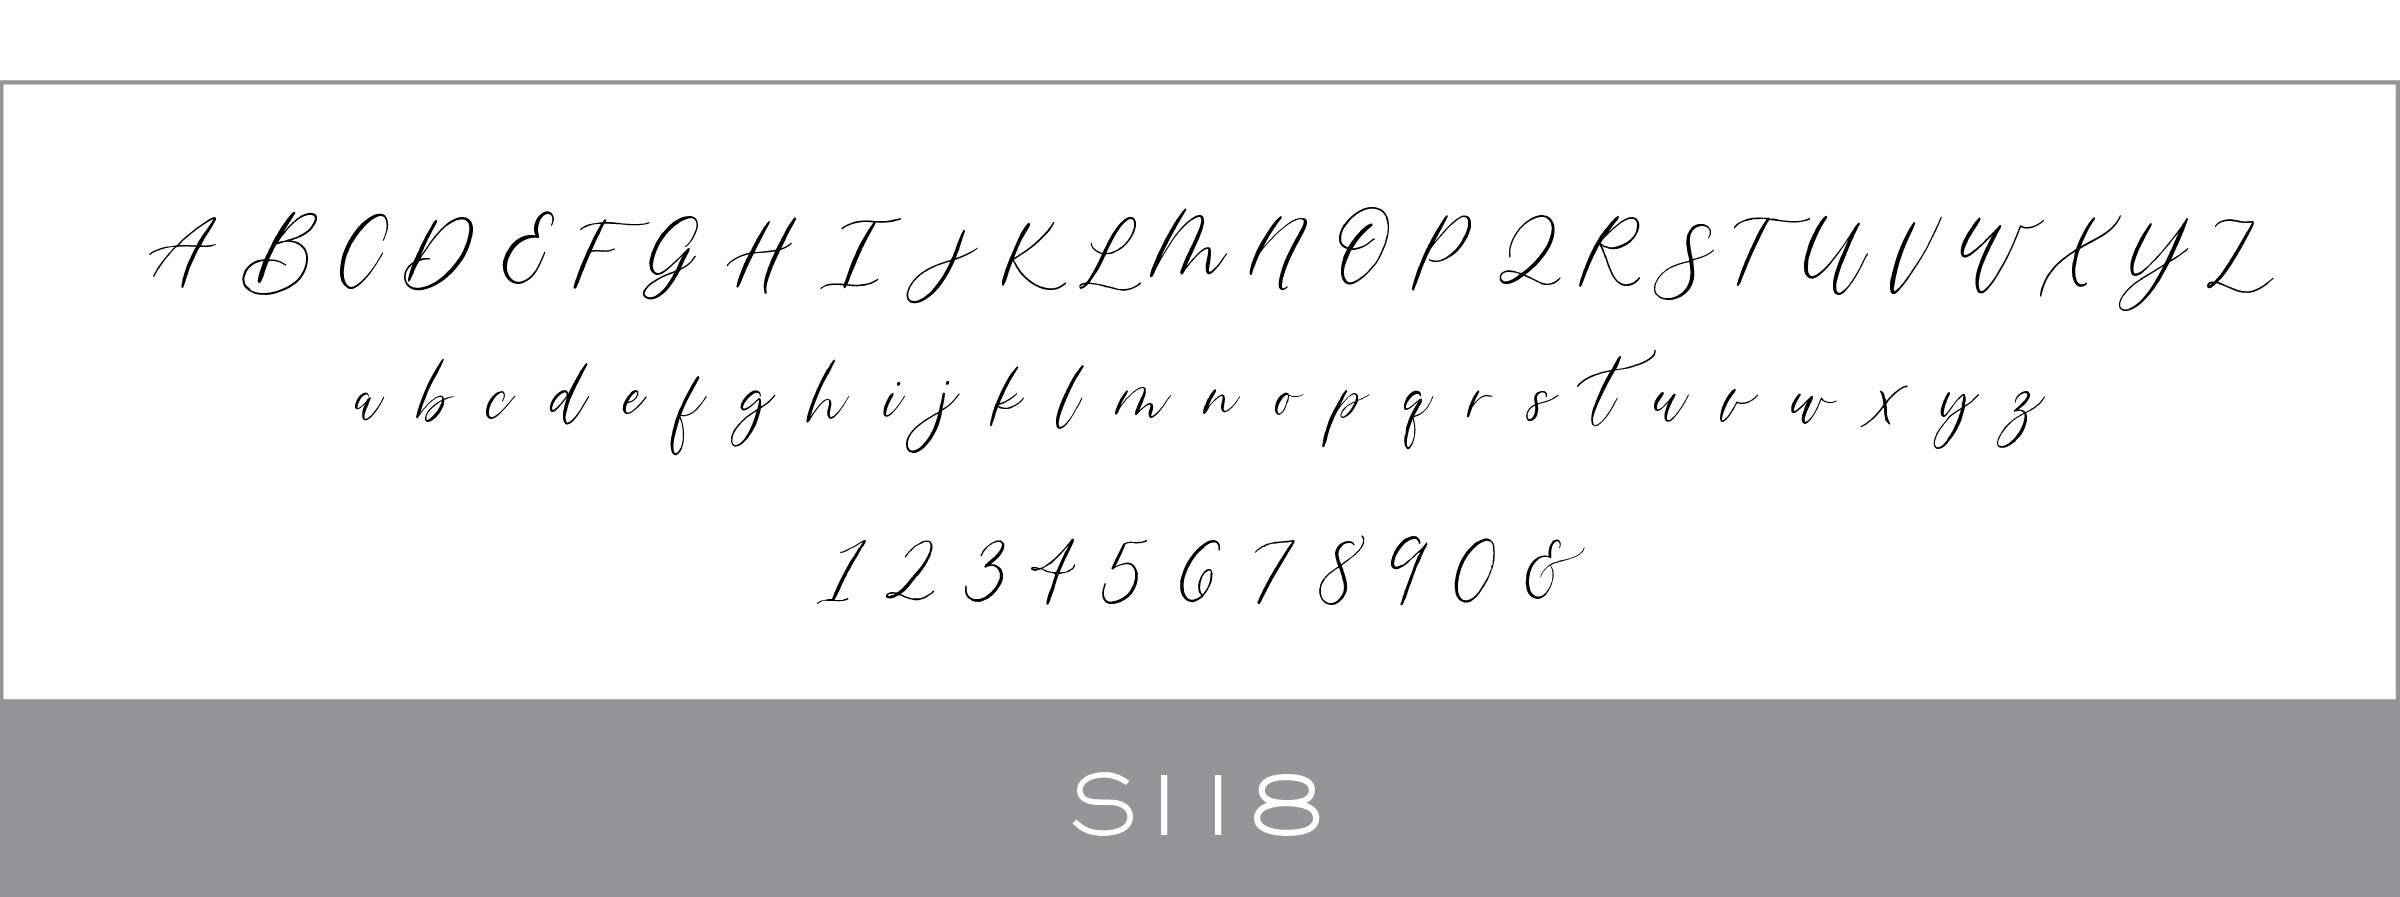 S118_Haute_Papier_Font.jpg